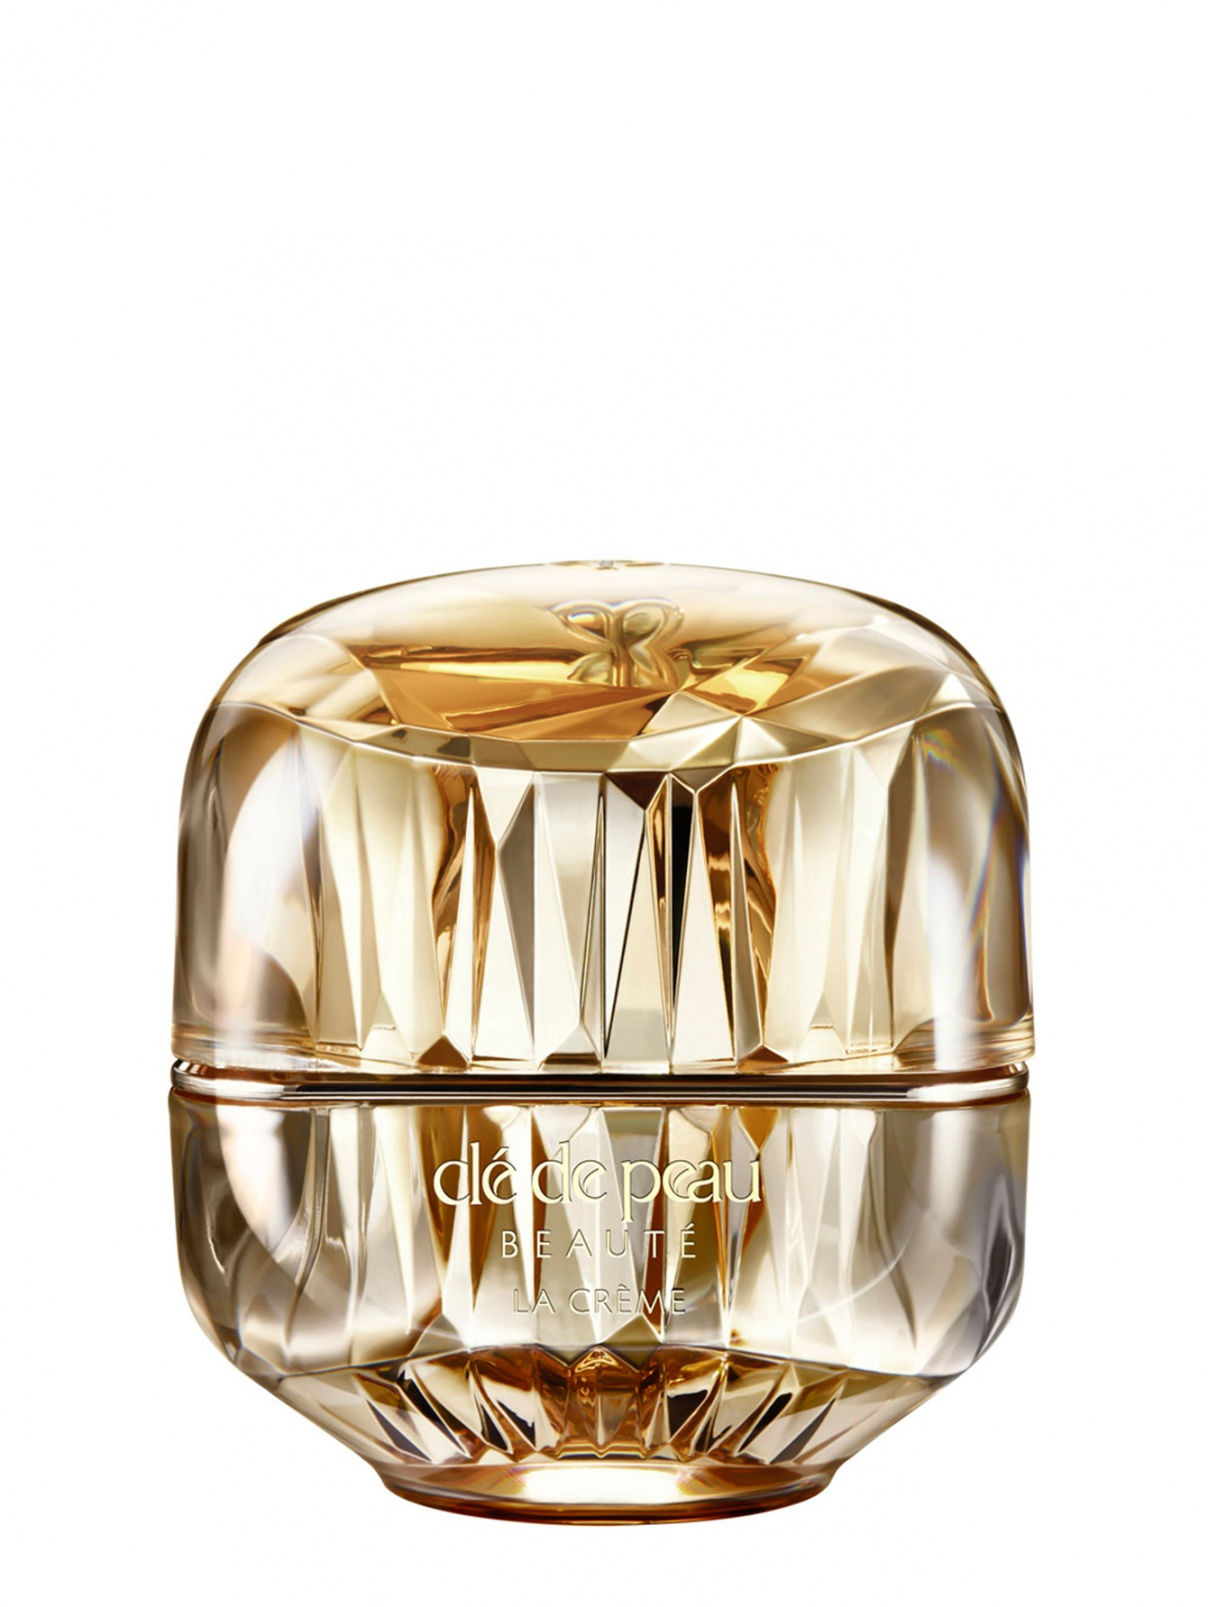 Крем для лица La Crème, 30 мл CLE DE PEAU BEAUTE  –  Общий вид